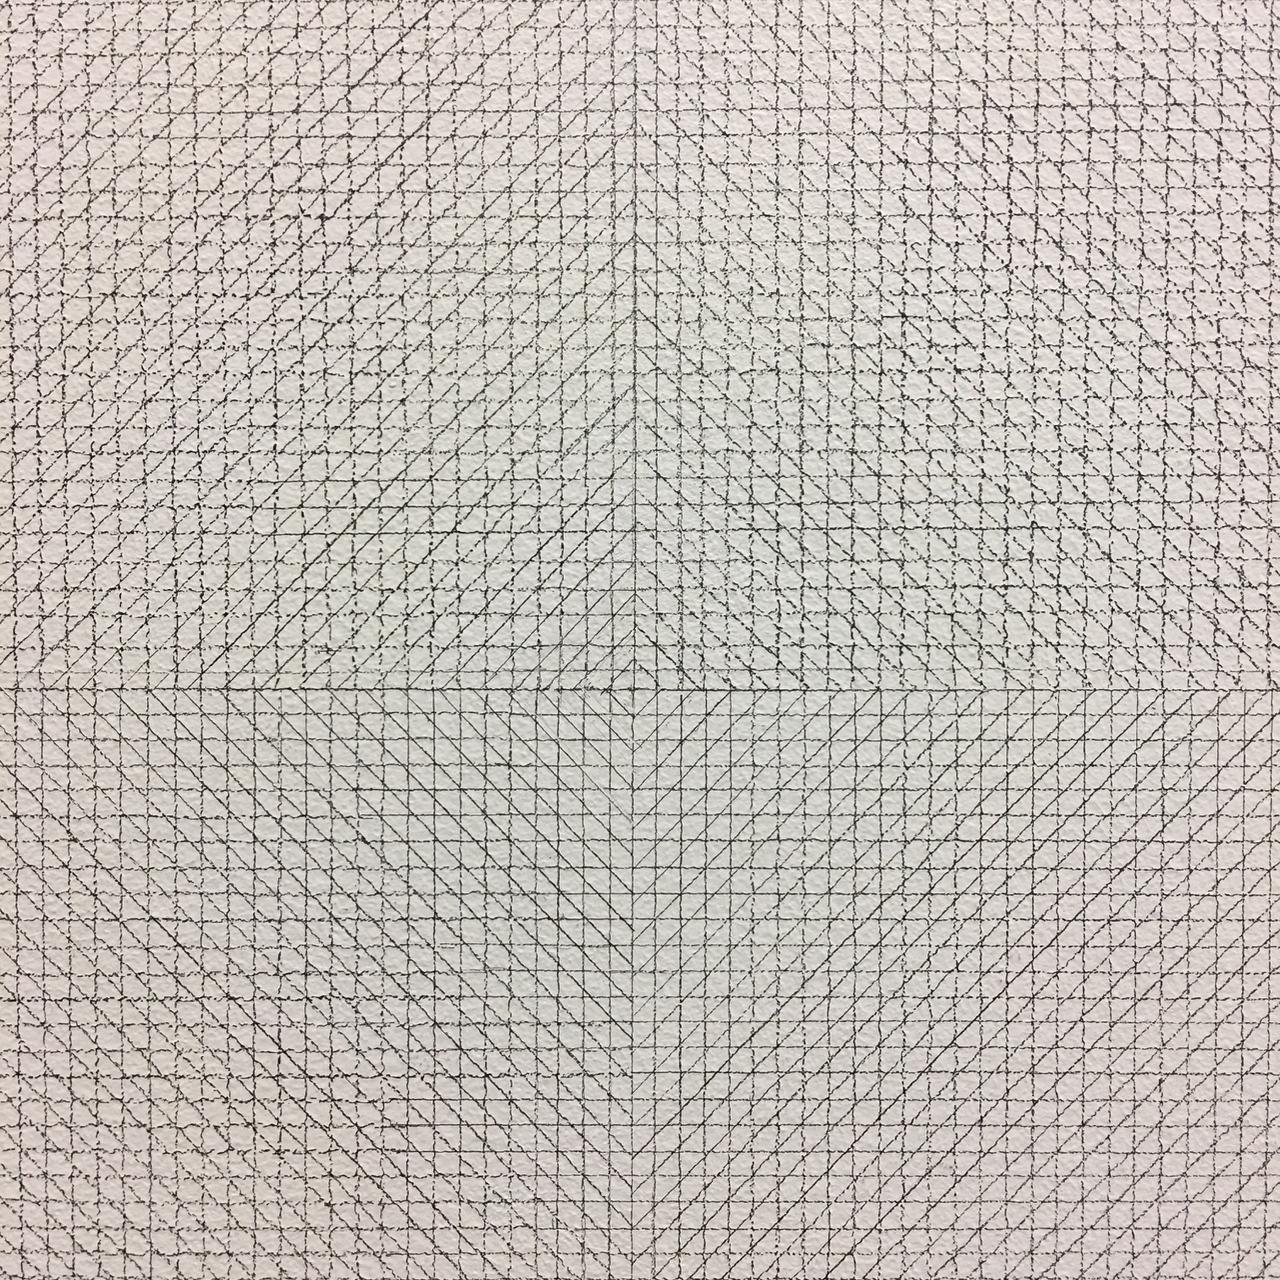 Detail shot of the version on display at MASSMoCA